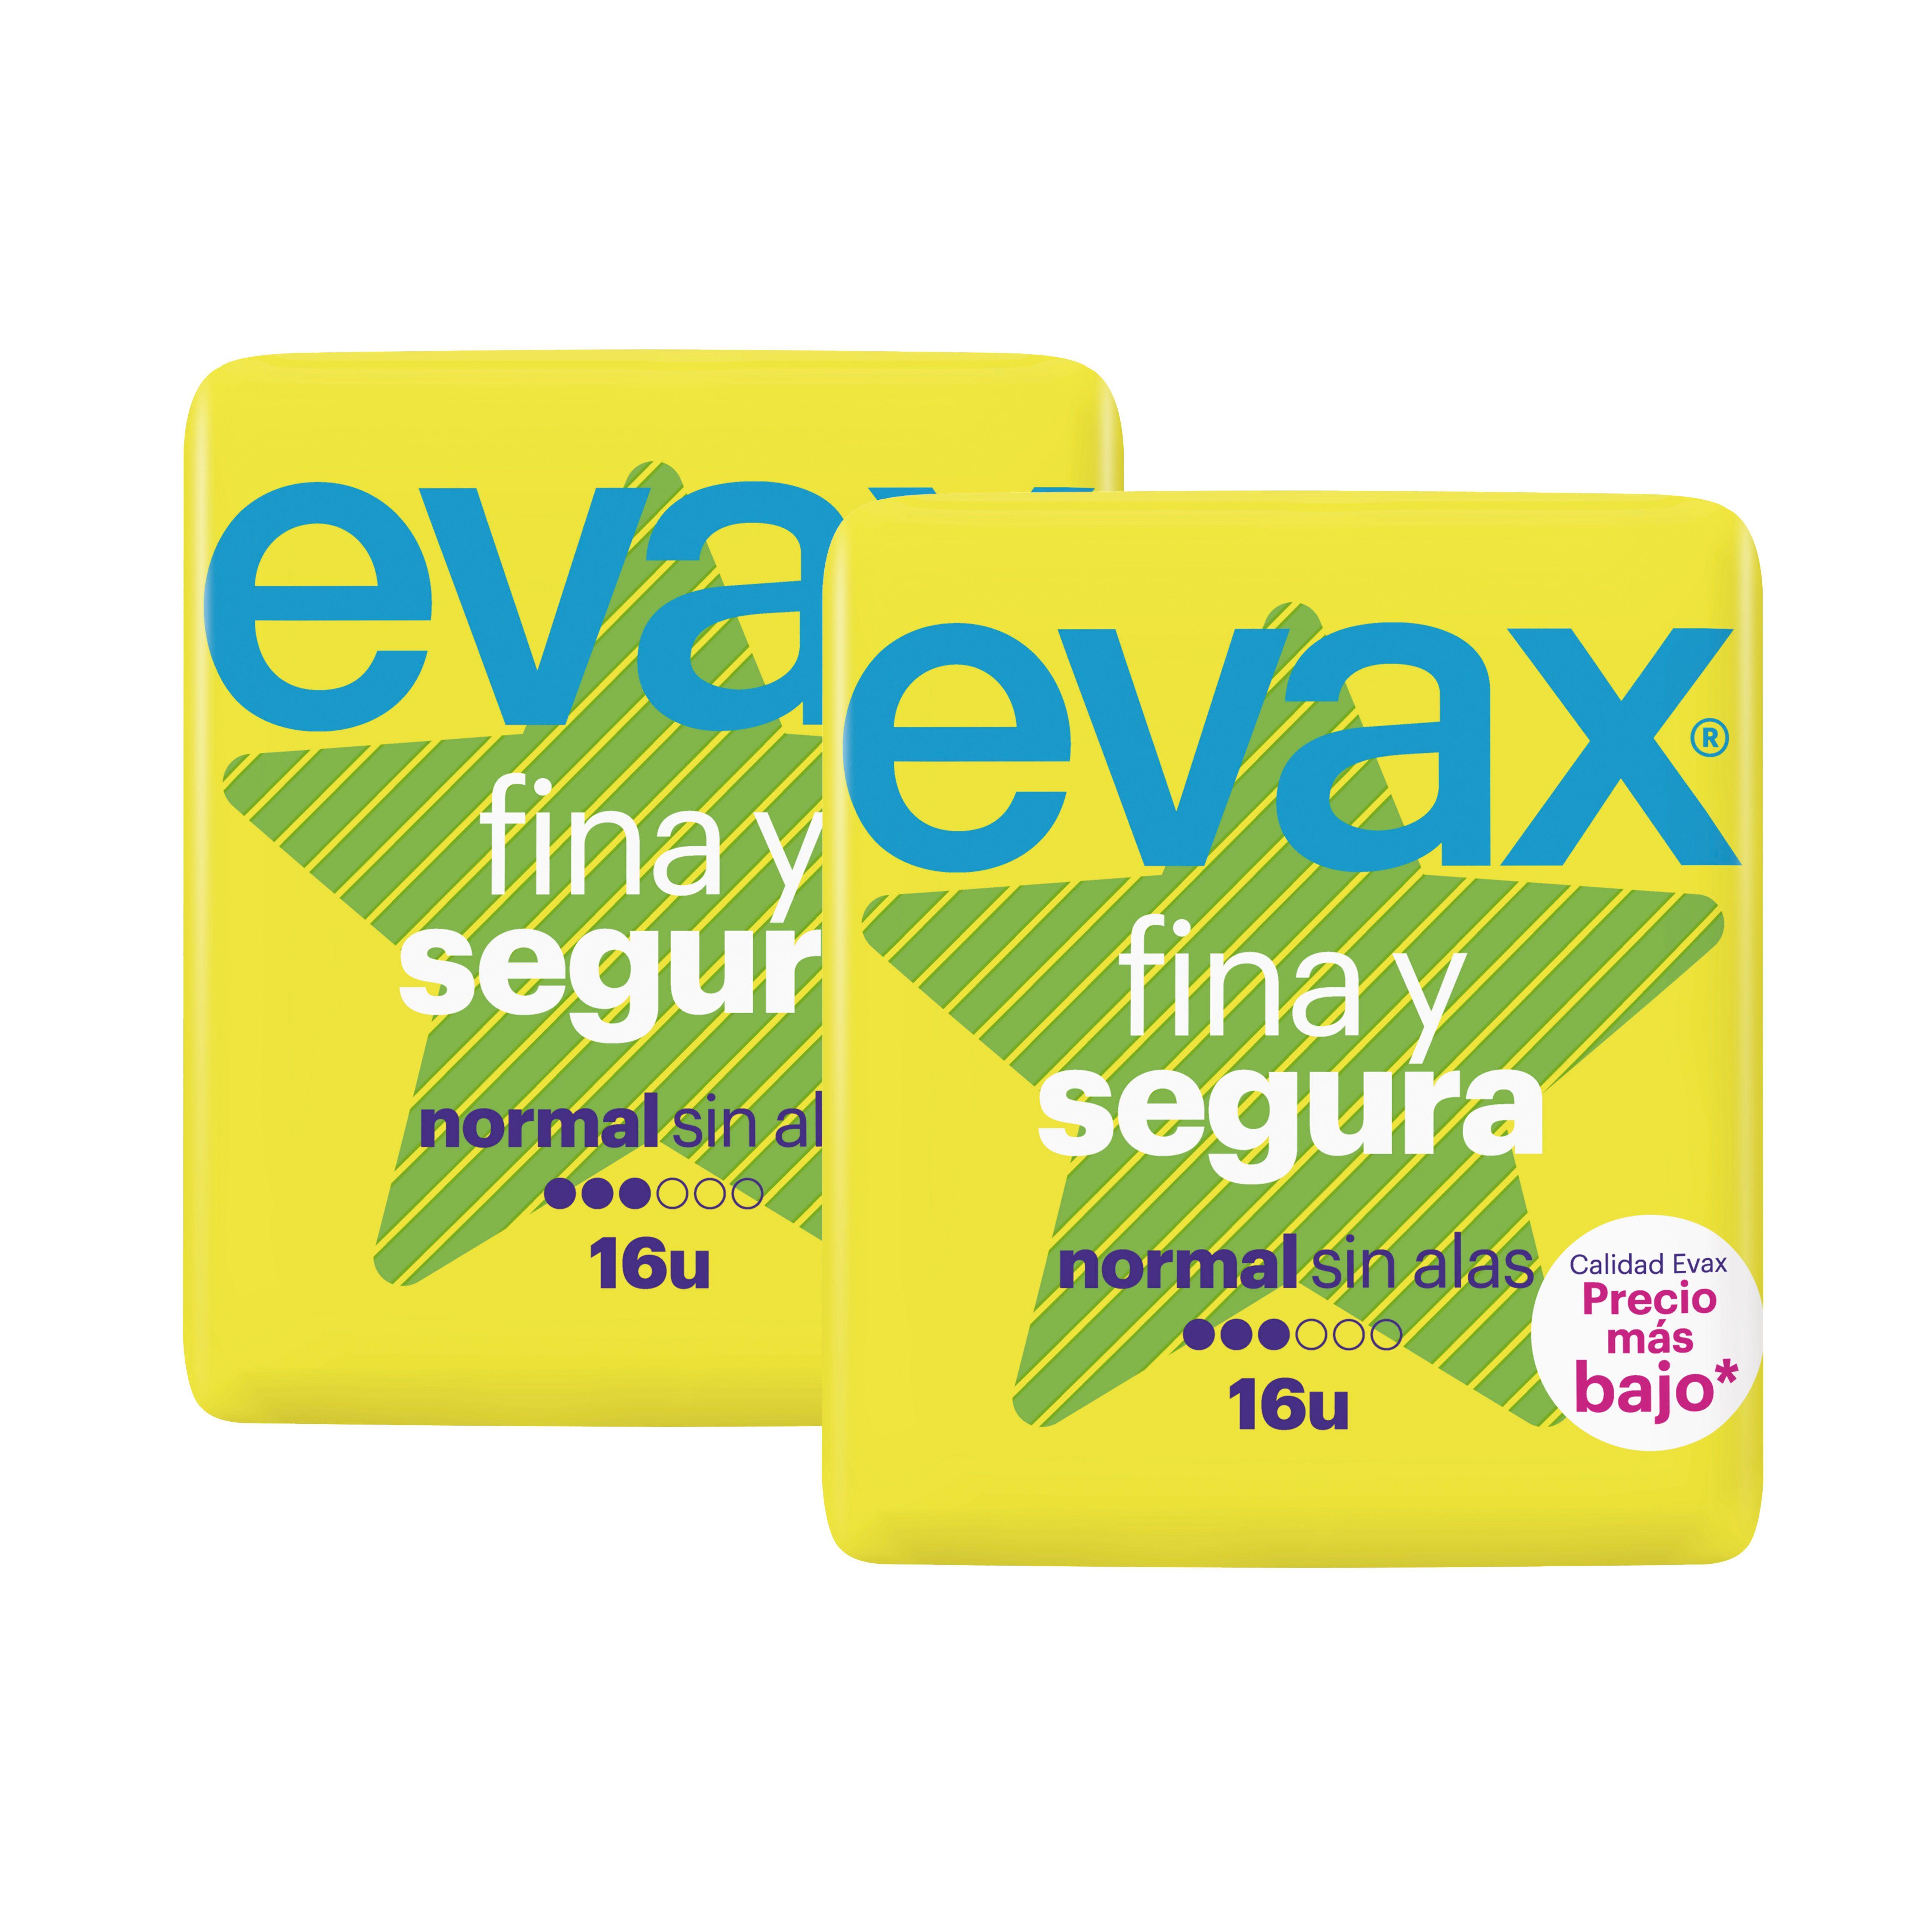 Oferta de EVAX Compresa Fina y Segura sense ales, 16 unitats por 1,75€